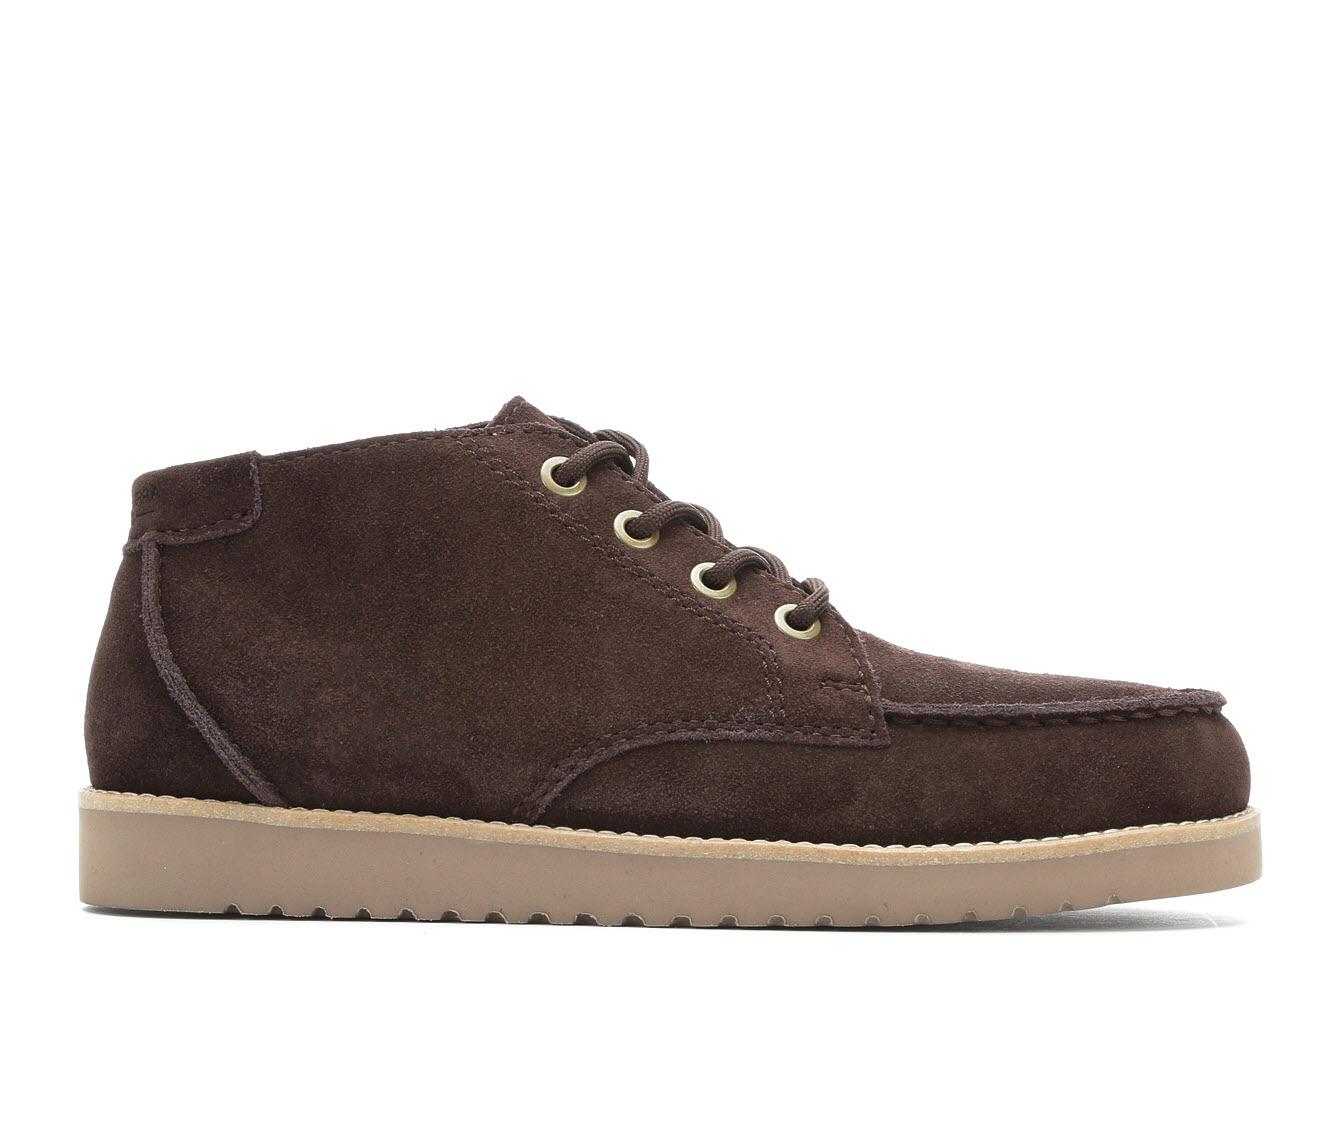 Koolaburra by UGG Kiran Men's Boots (Brown Suede)